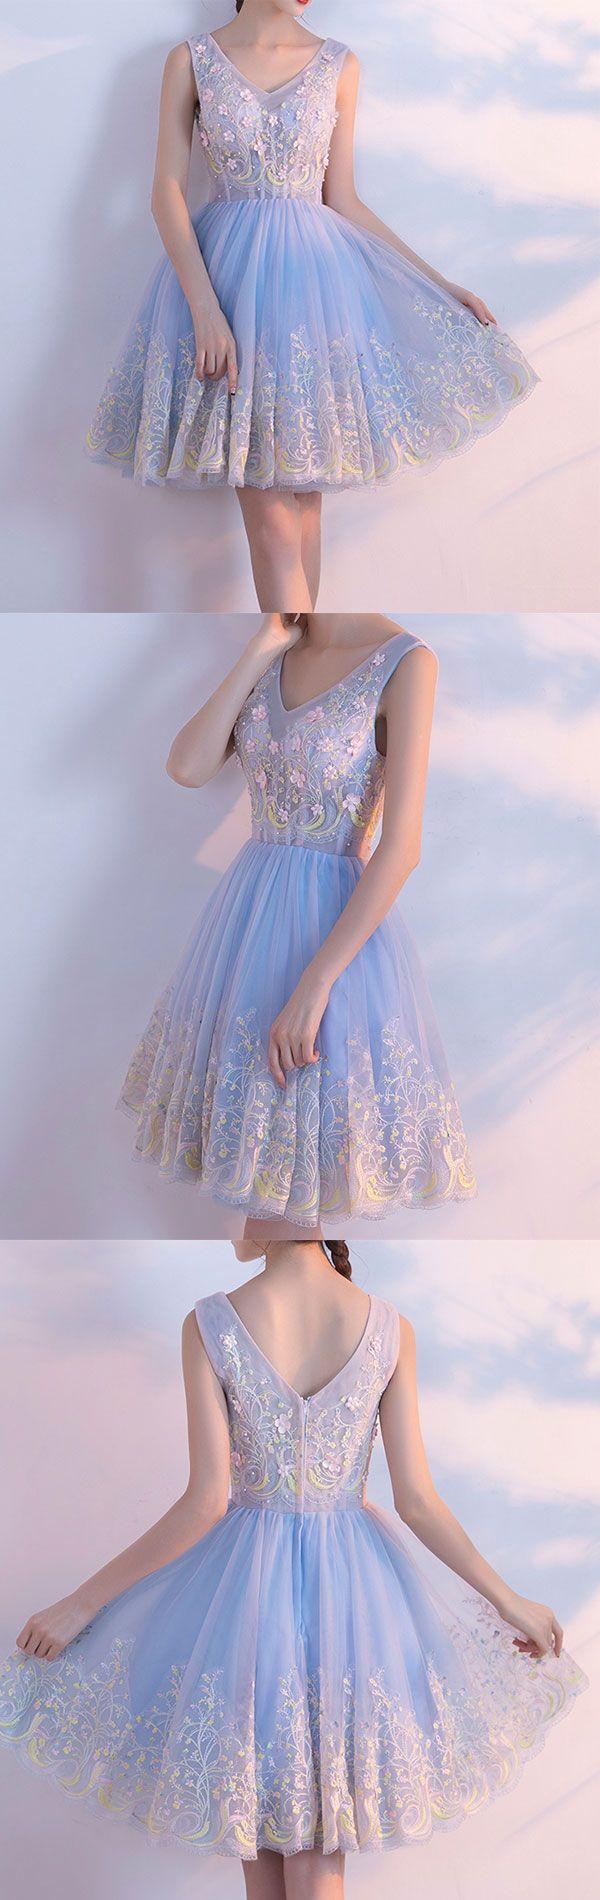 Cute light blue v neck tulle short prom dress homecoming dresses